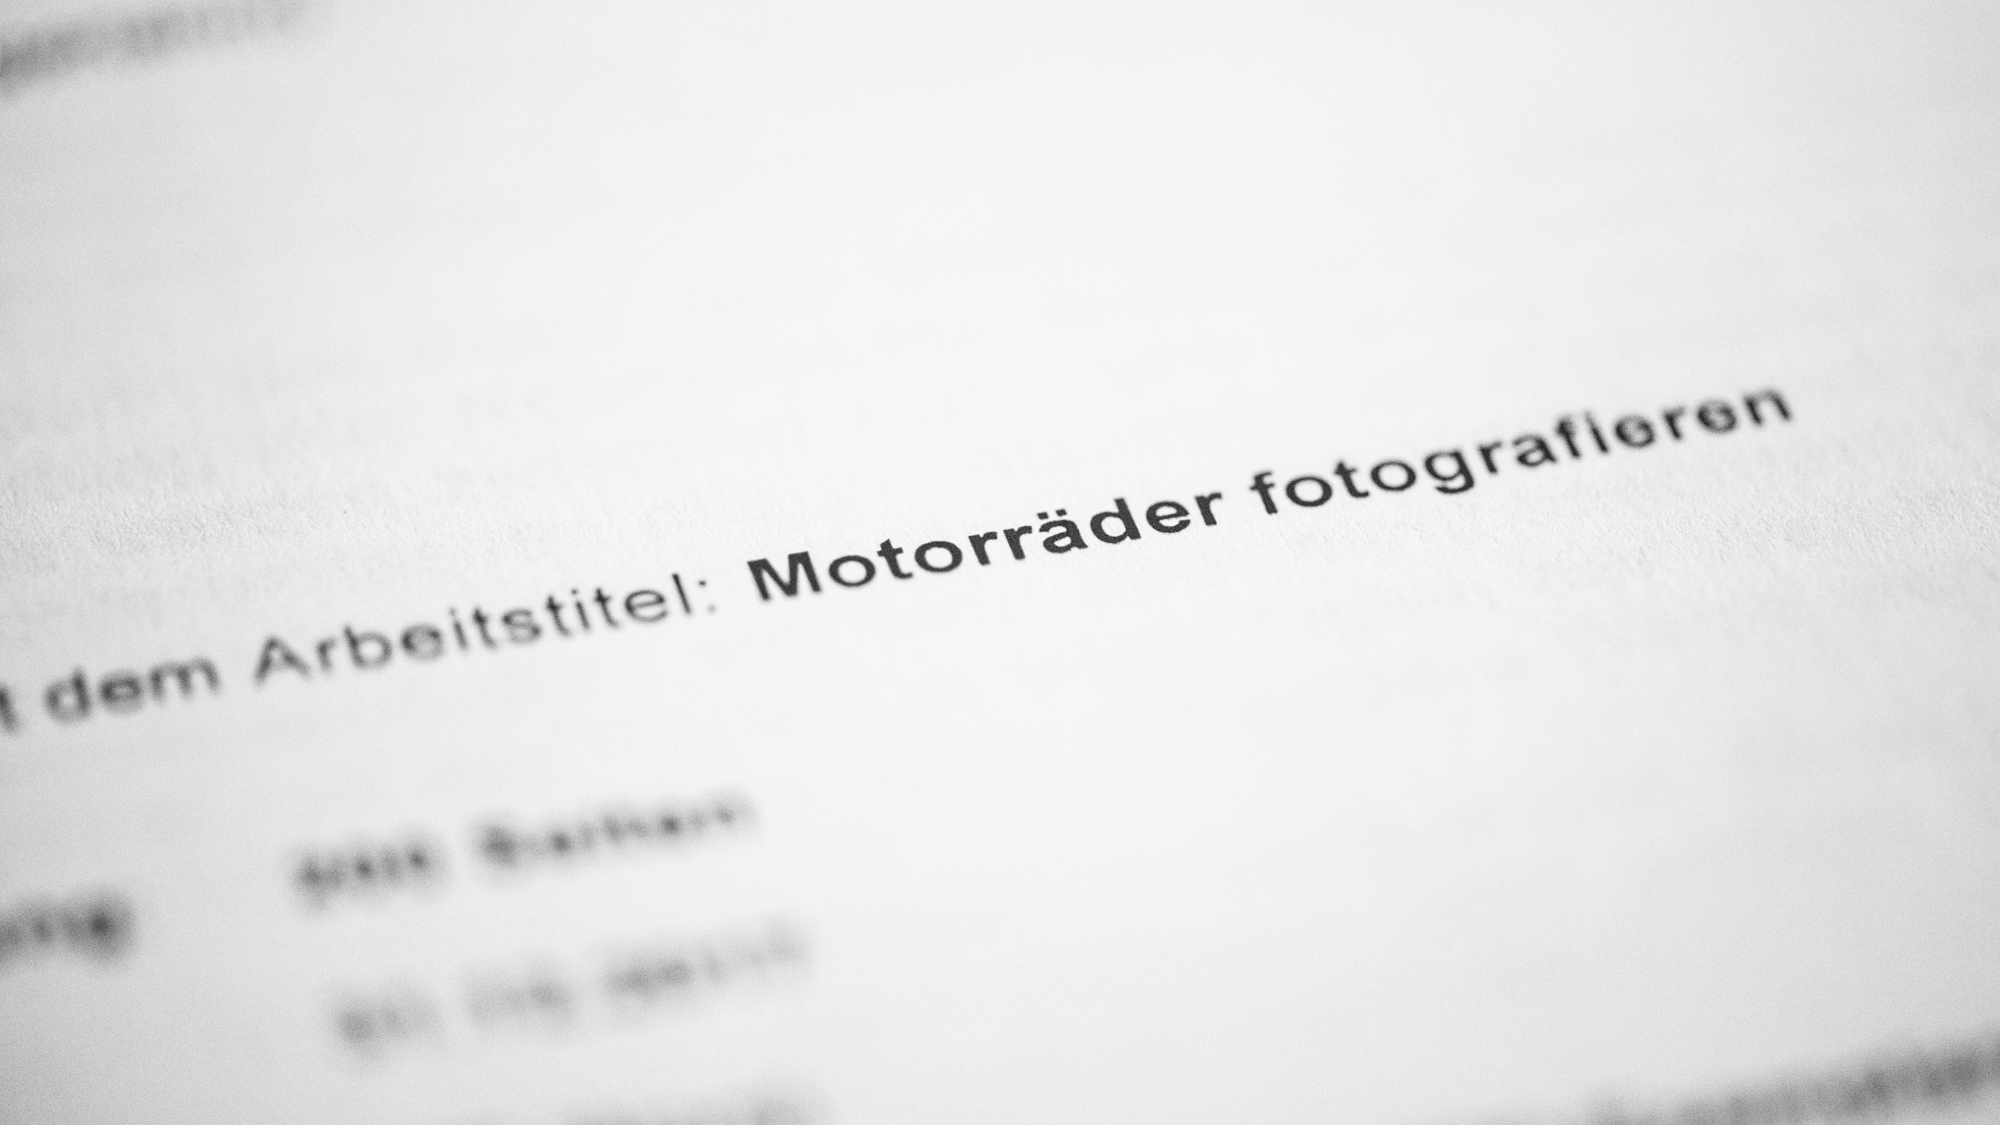 Projekt: Lehrbuch zur Motorradfotografie